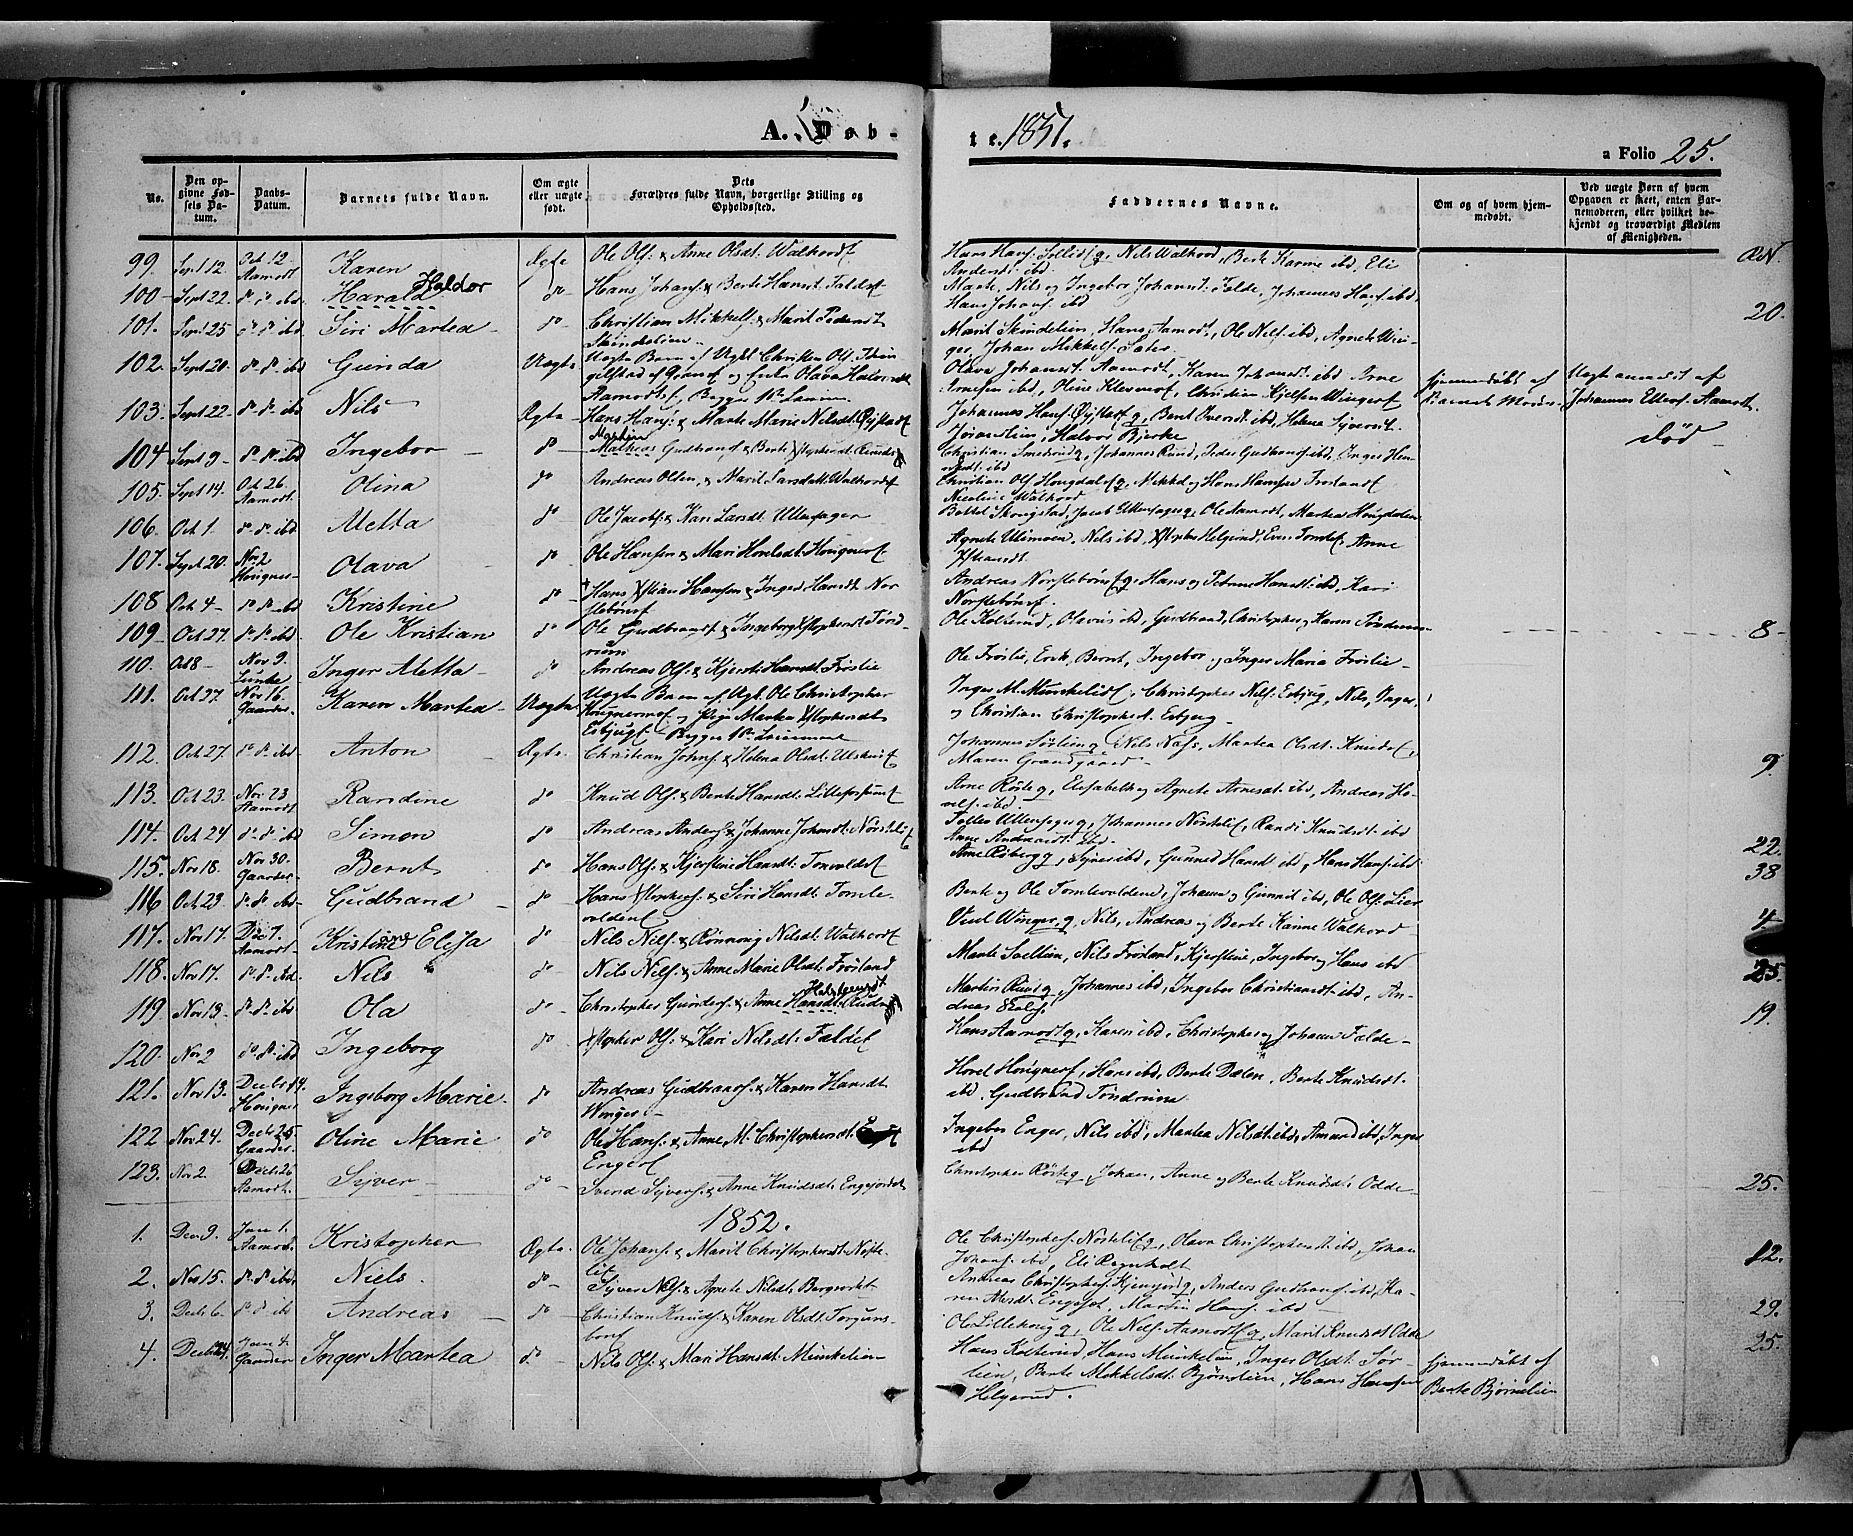 SAH, Land prestekontor, Ministerialbok nr. 10, 1847-1859, s. 25